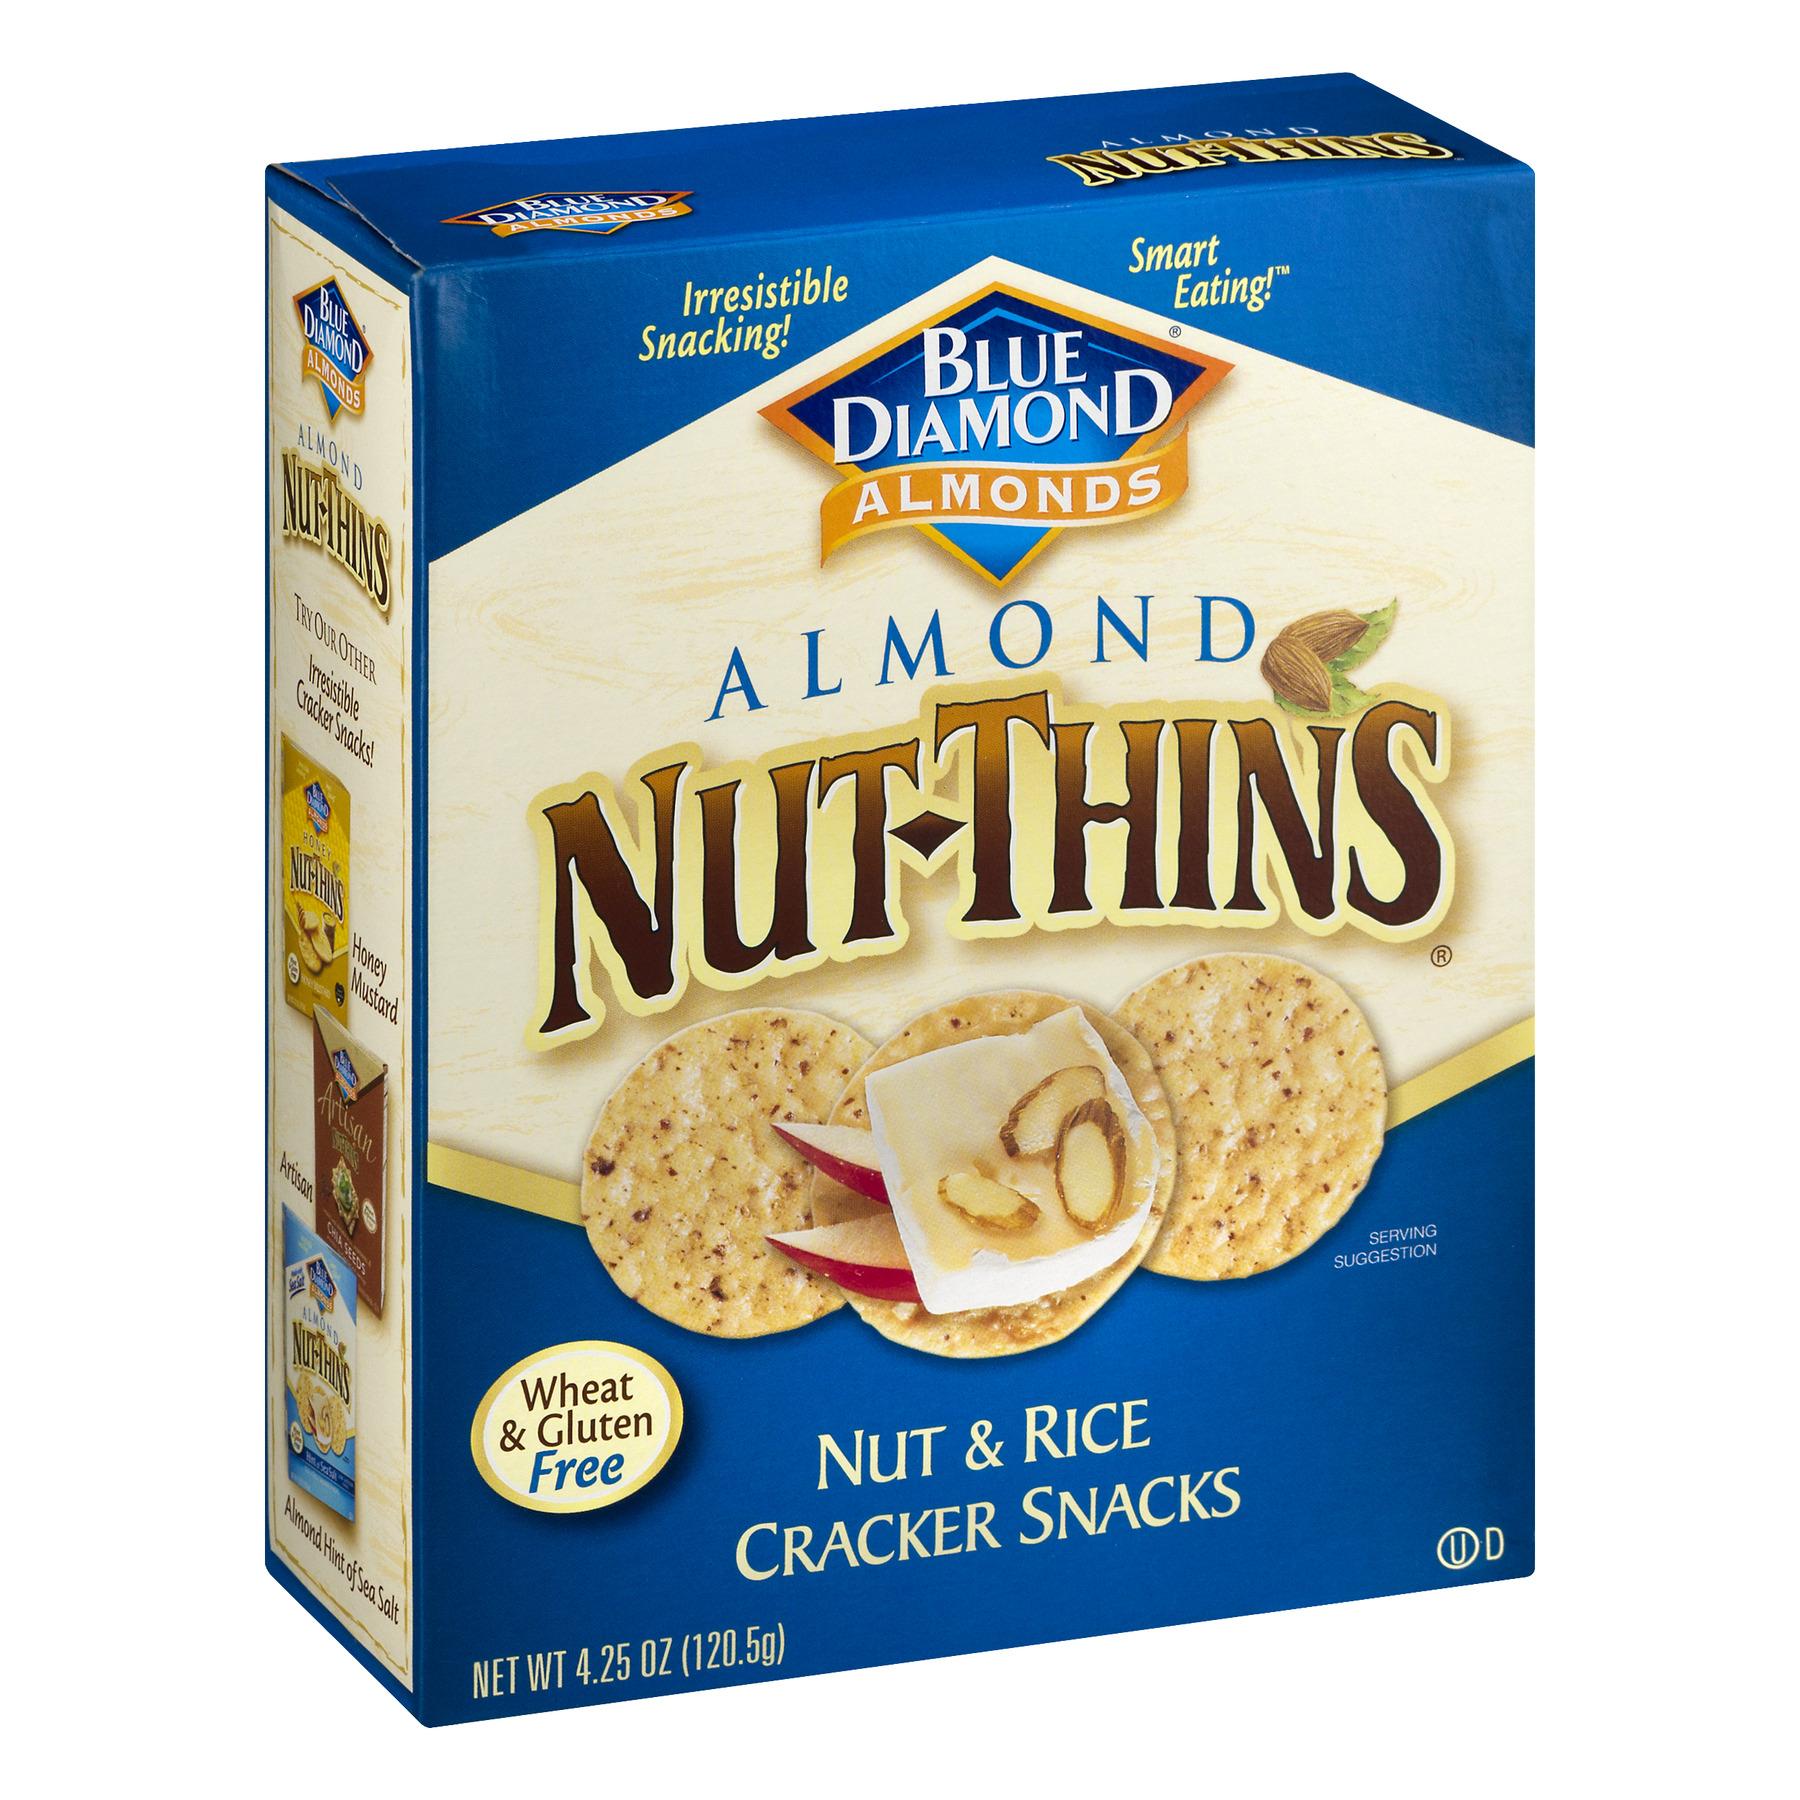 nut thins crackers original almond 4 25 oz box walmart com